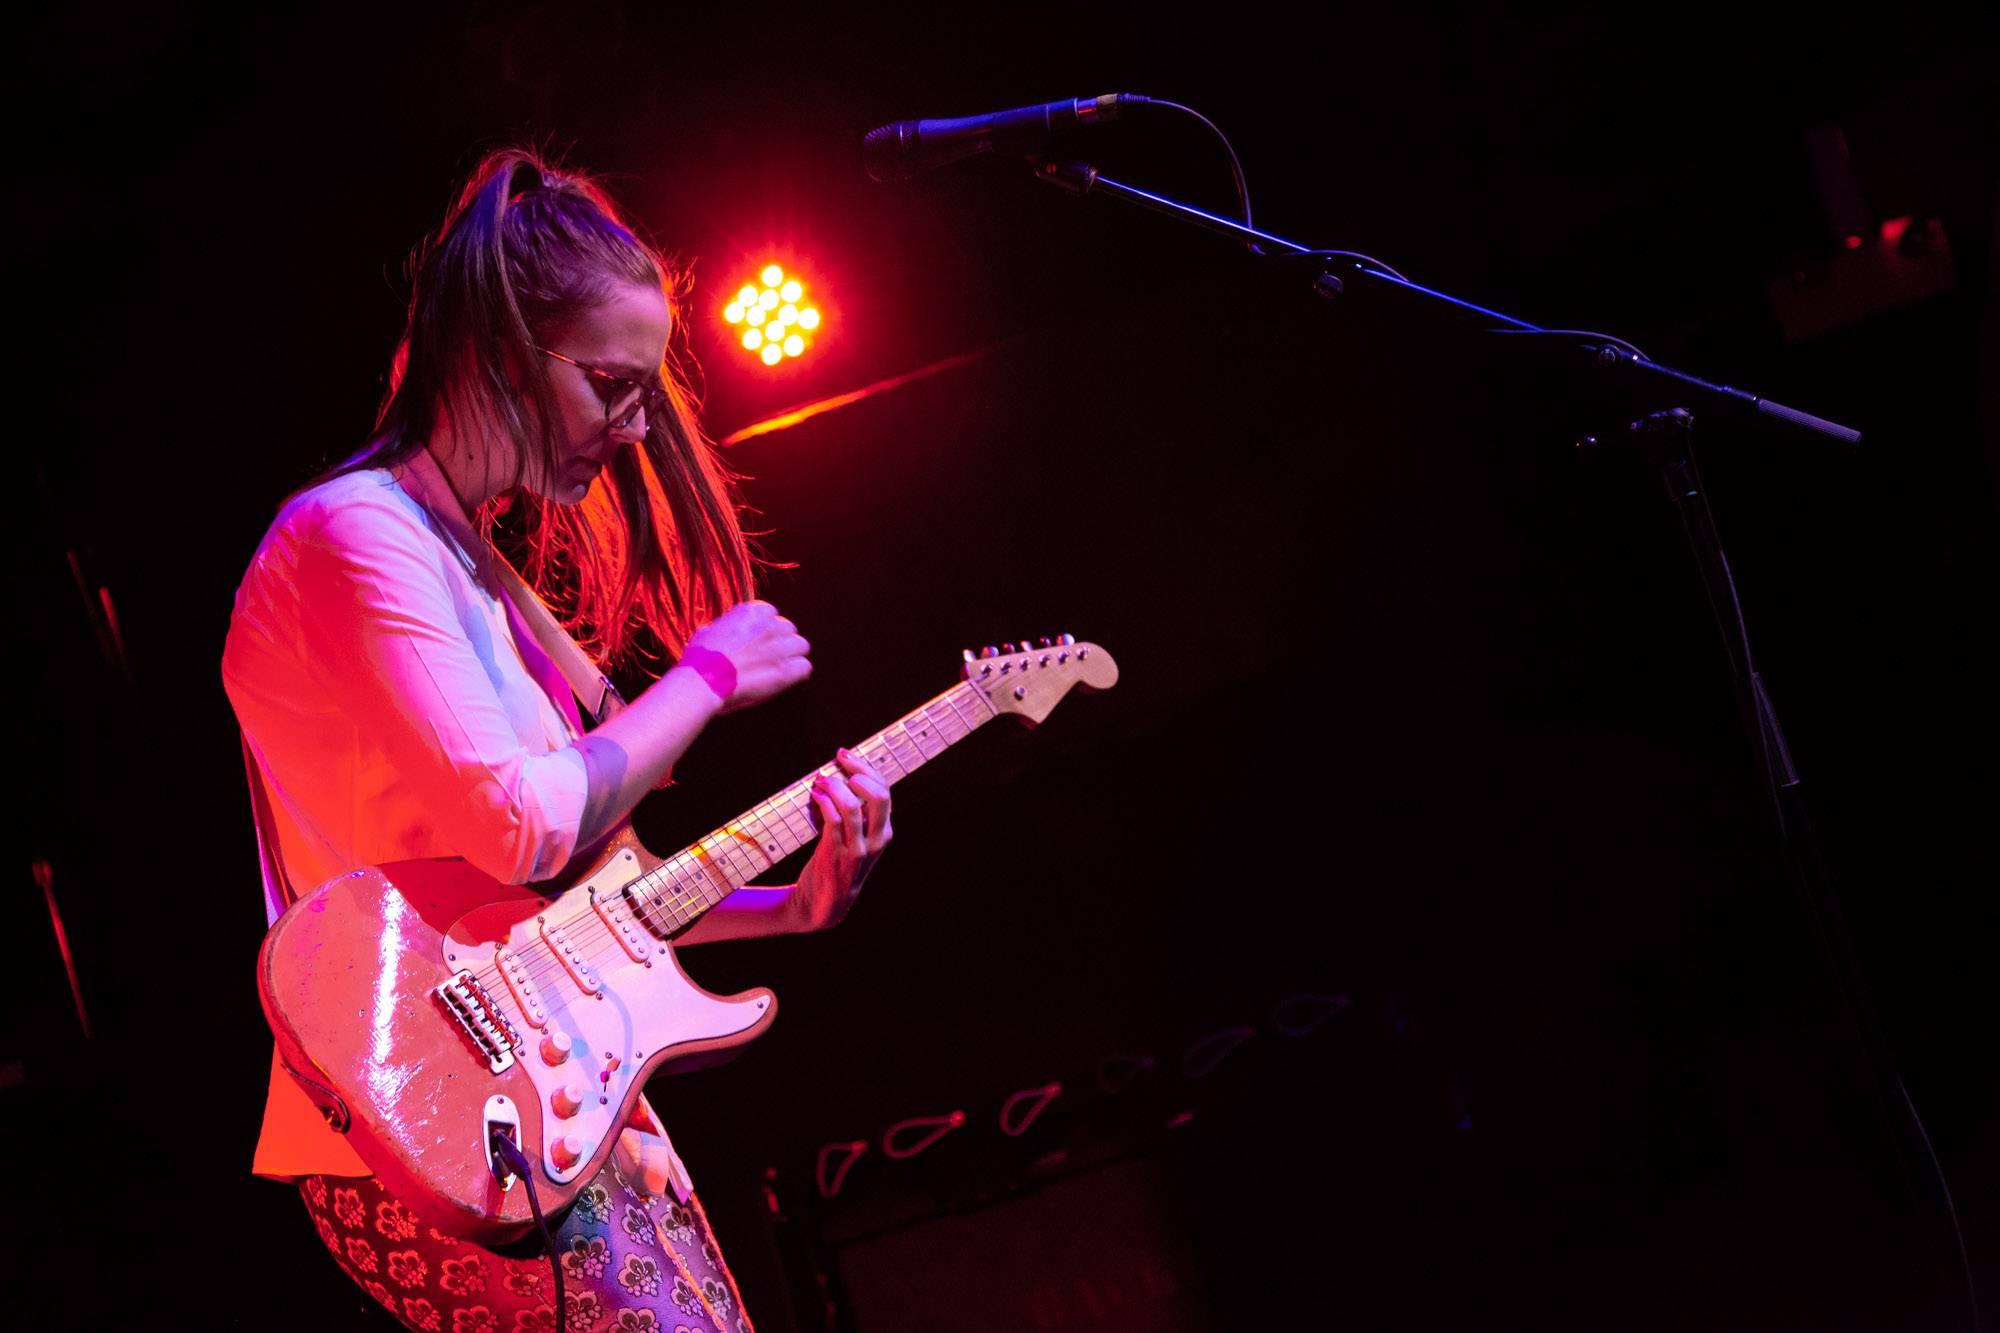 Margaret Glaspy at Westward Festival, Vancouver, Sep 15 2018. Kirk Chantraine photo.